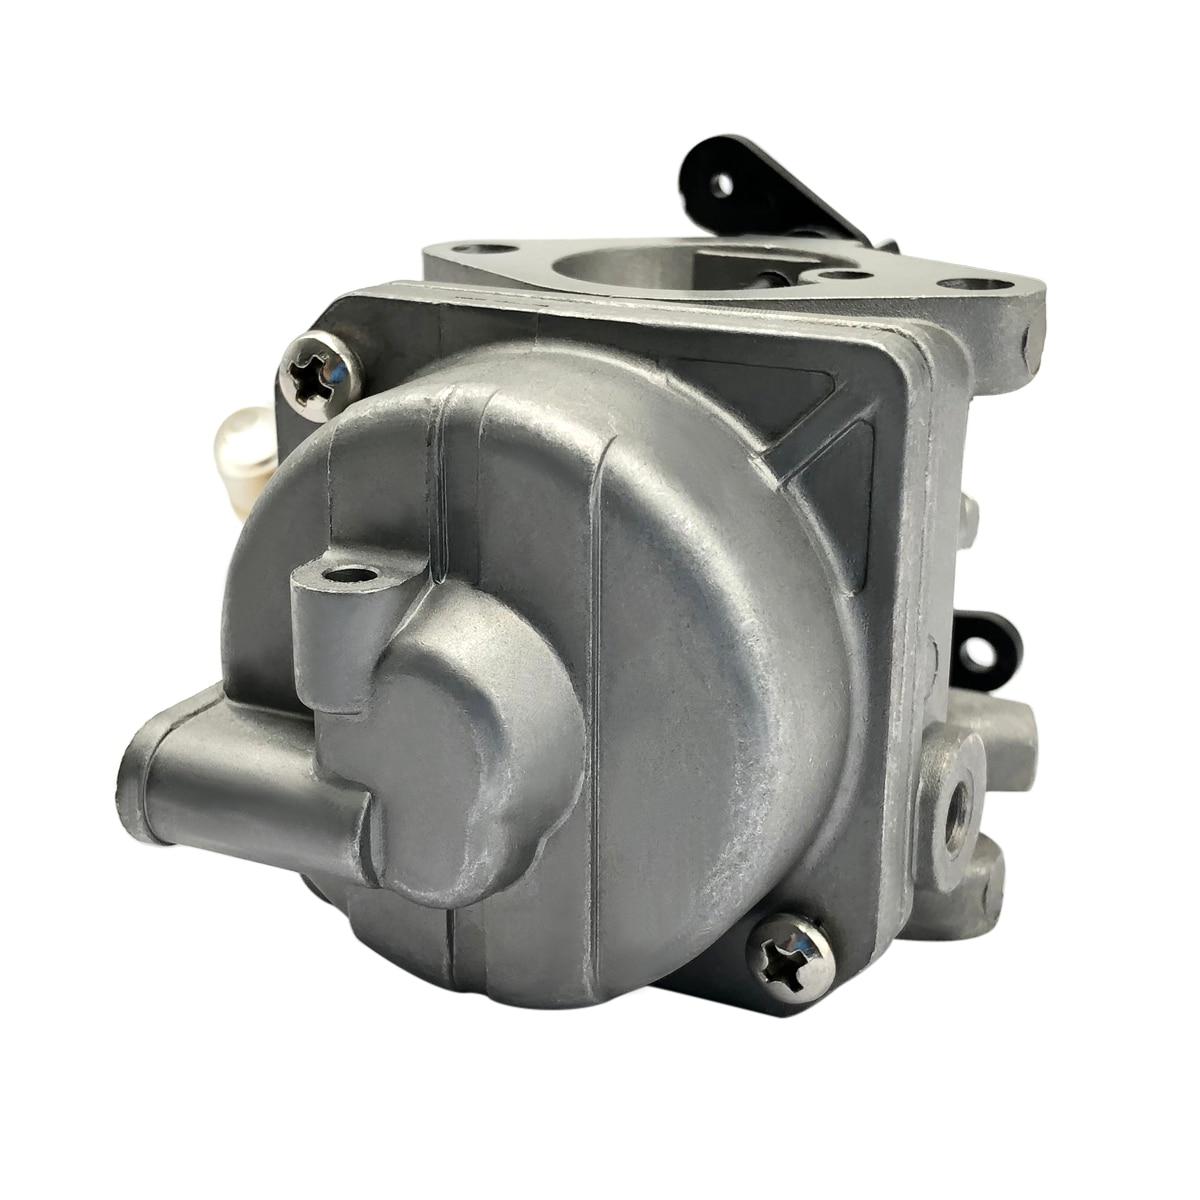 3R4-03200-1 0 Carburador para Tohatsu Nissan MFS6A2 NSF6A2 MFS6B NFS6B Barco a Motor